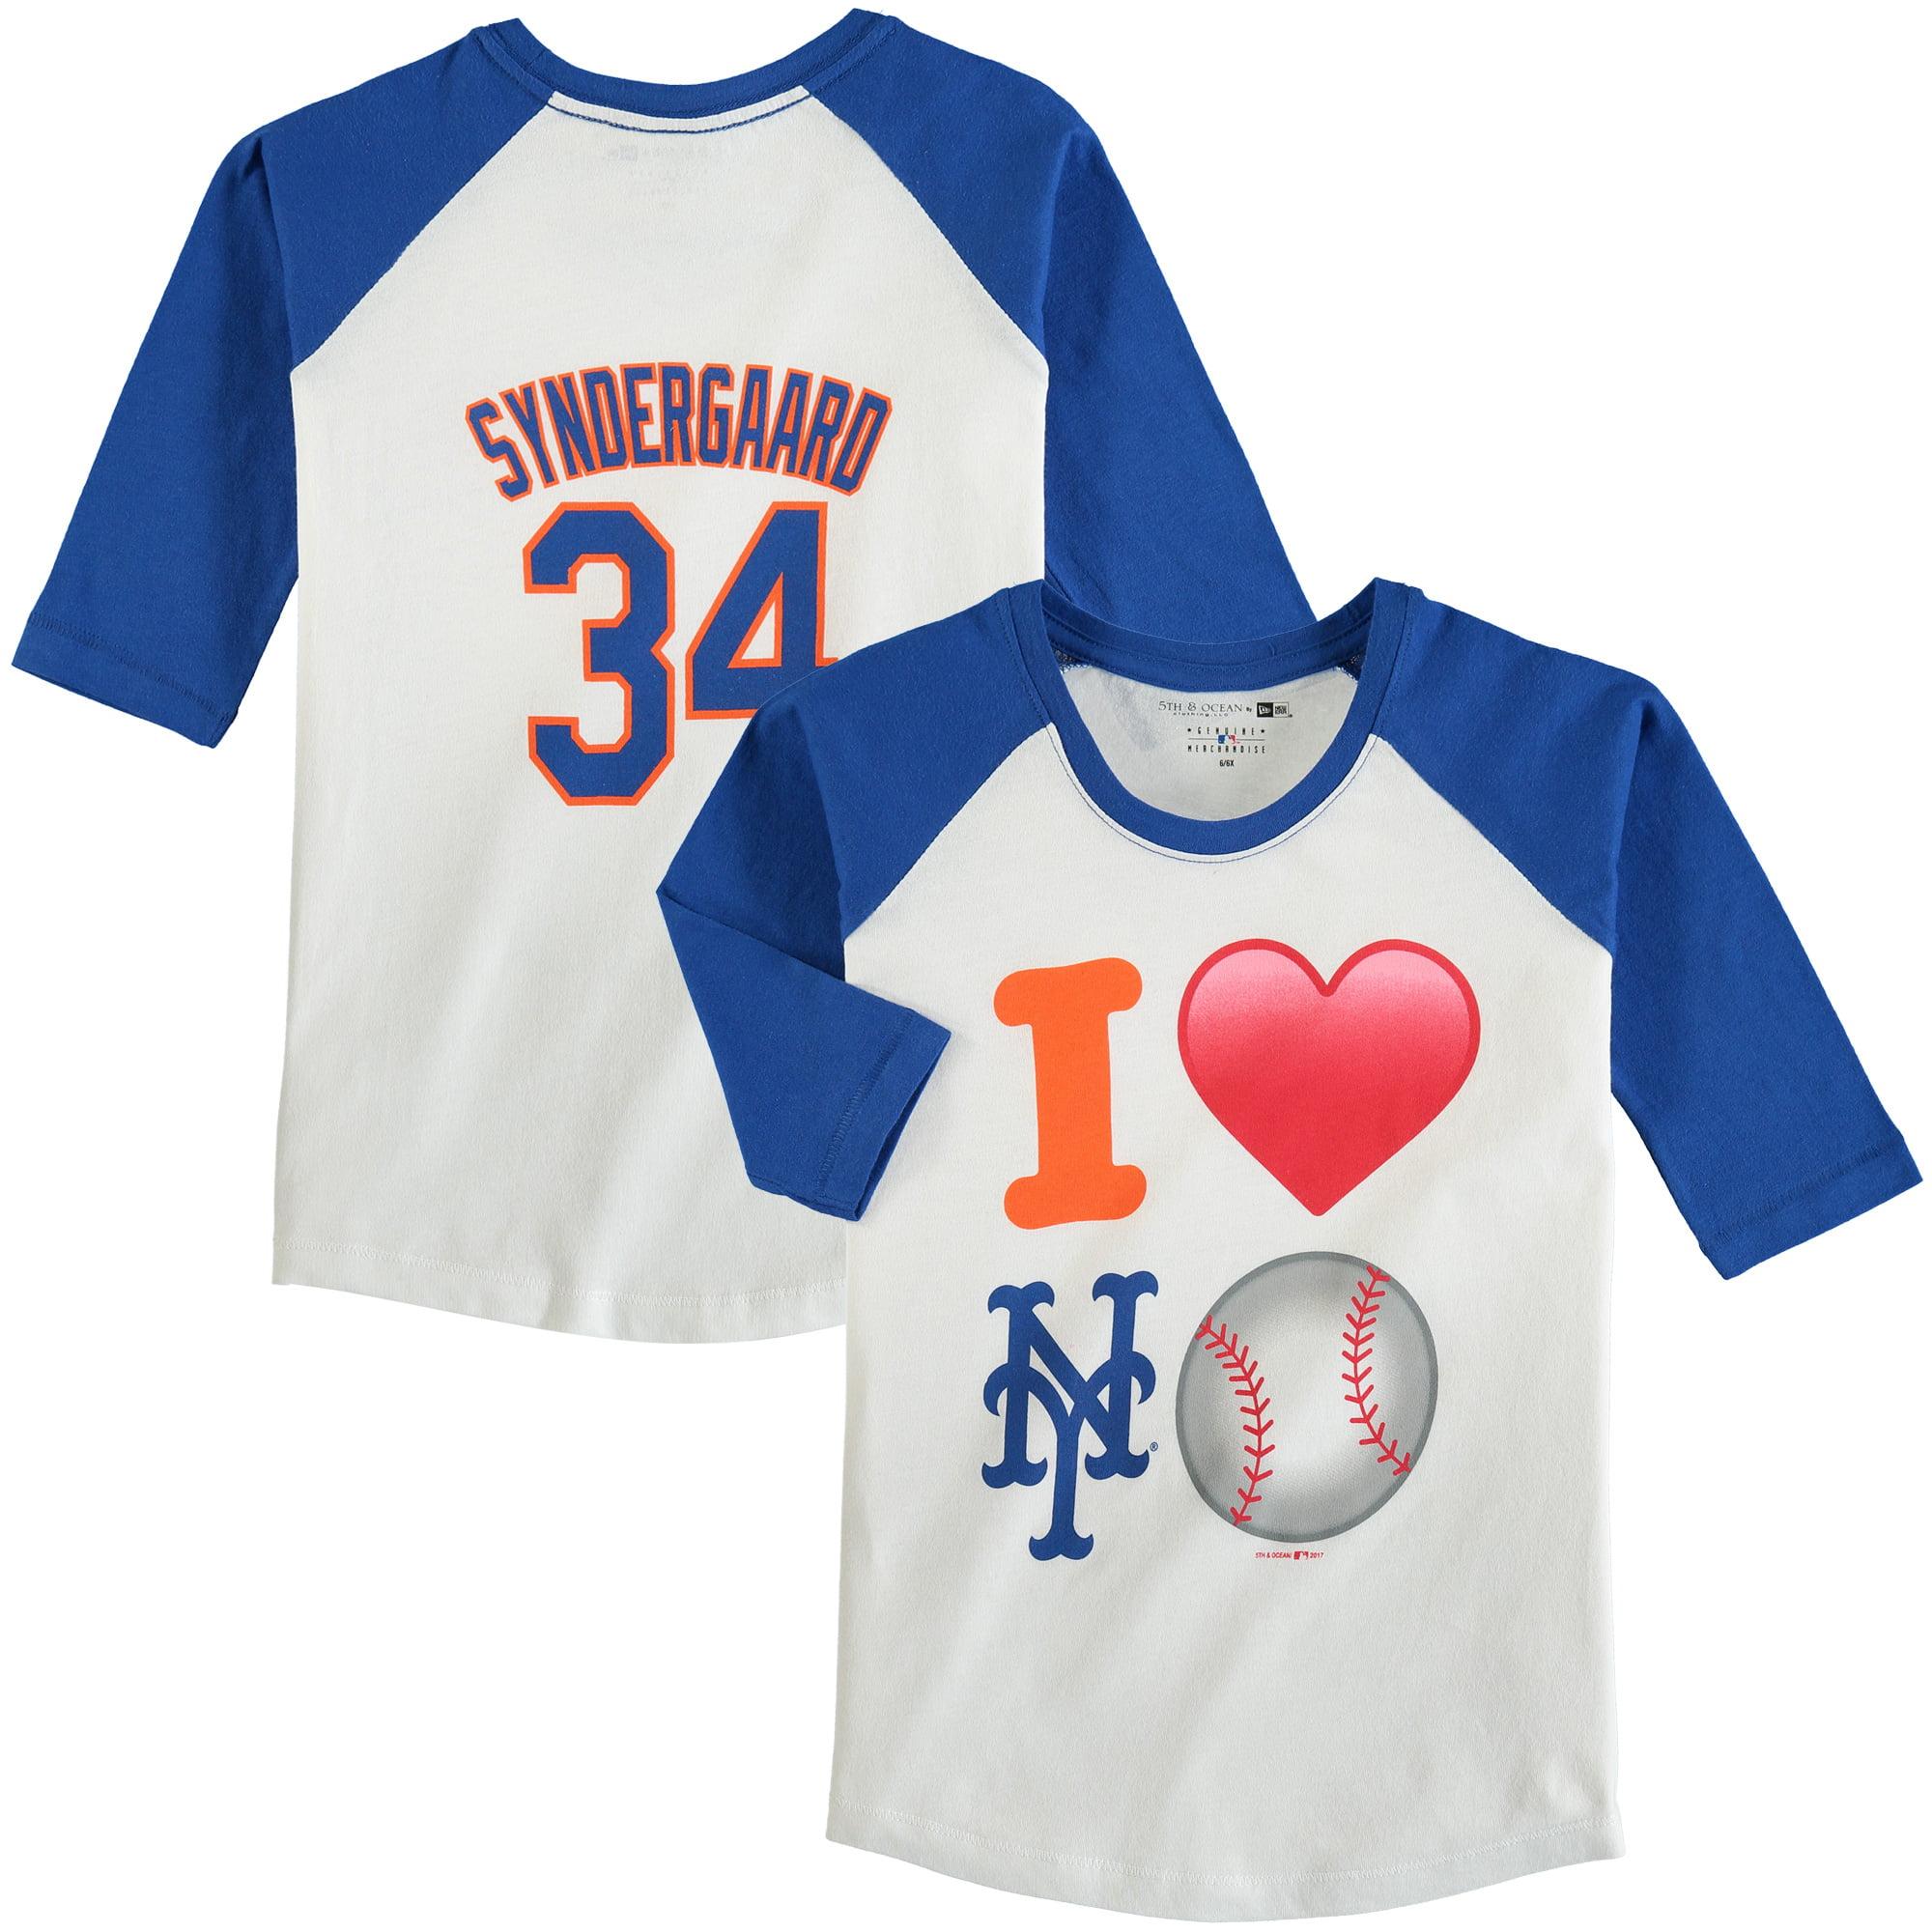 Noah Syndergaard New York Mets 5th & Ocean by New Era Girls Youth Emoji Love Player Name & Number 3/4-Sleeve Raglan T-Shirt - White/Royal